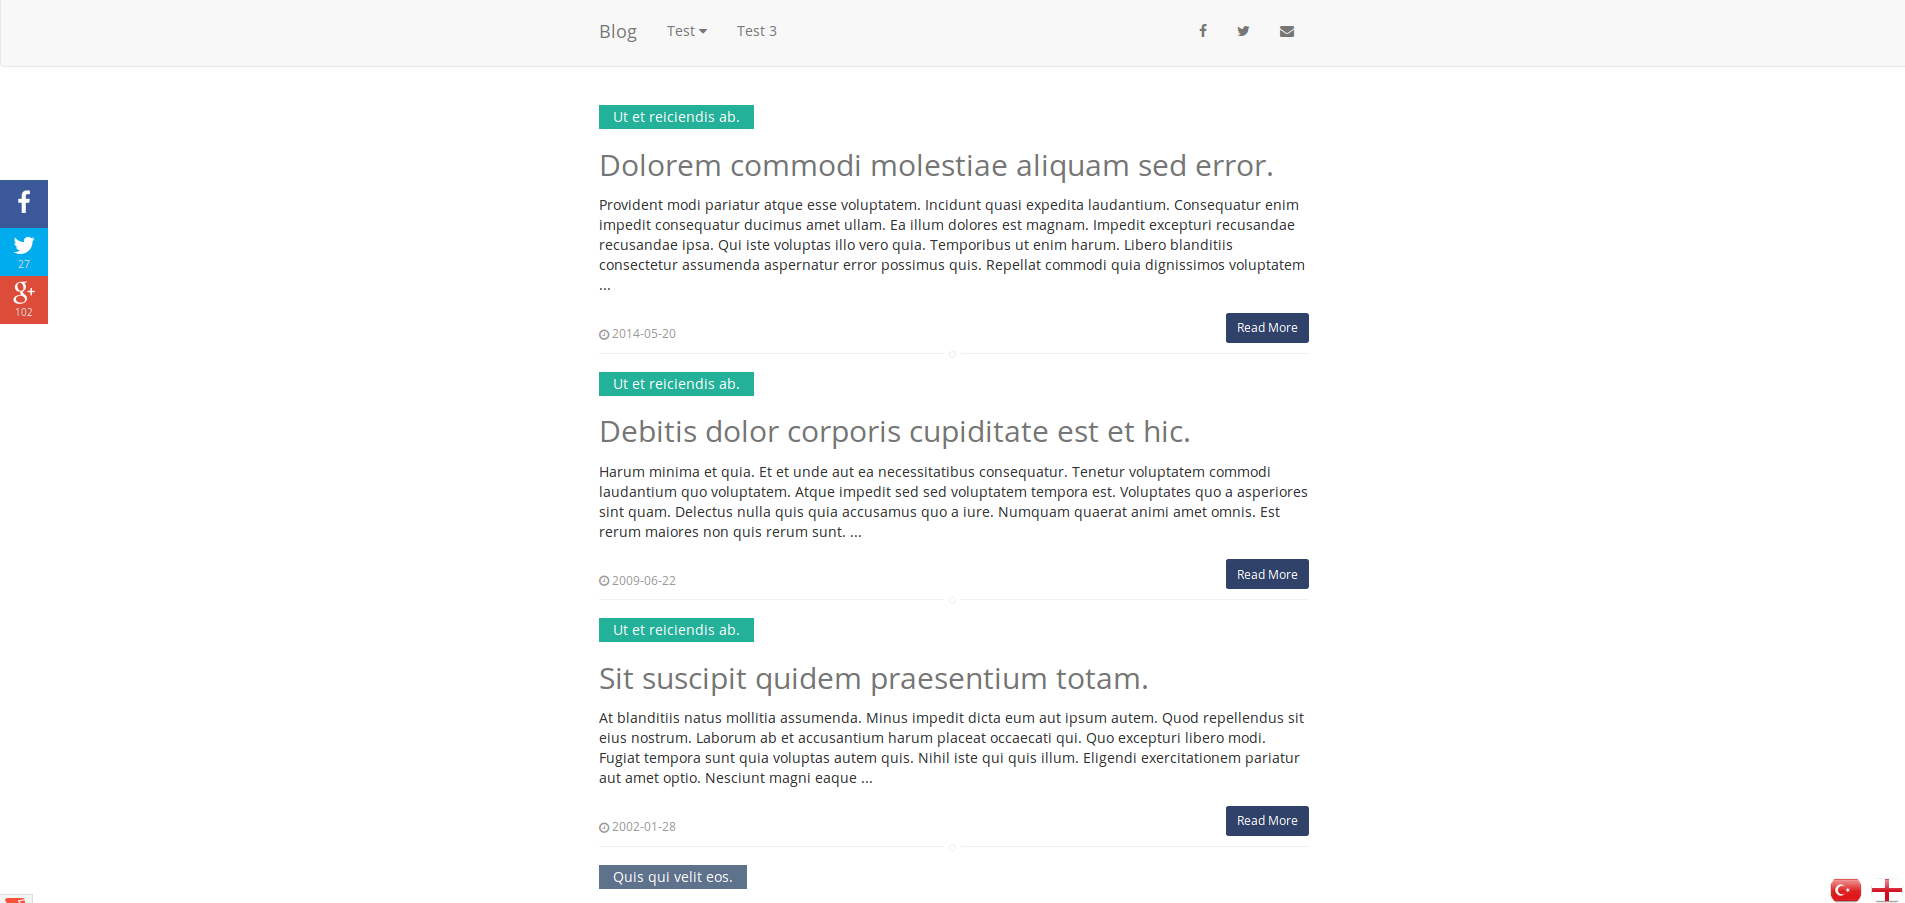 ozdemirburak/laravel-5-simple-cms - Libraries io